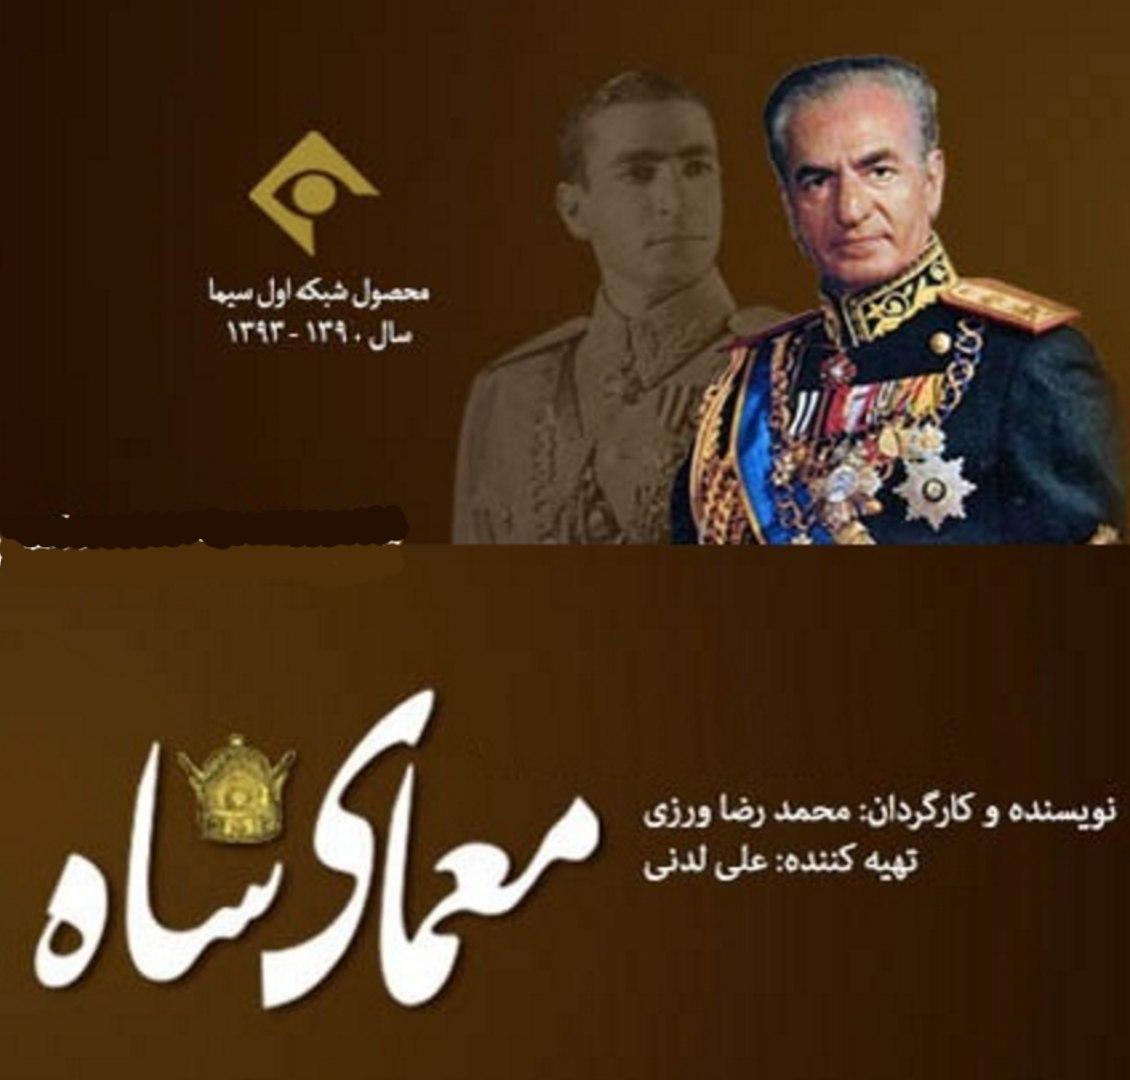 Serial Moammaye Shah 18 - سریال معمای شاه ۱۸ - قسمت هجدهم - video  dailymotion